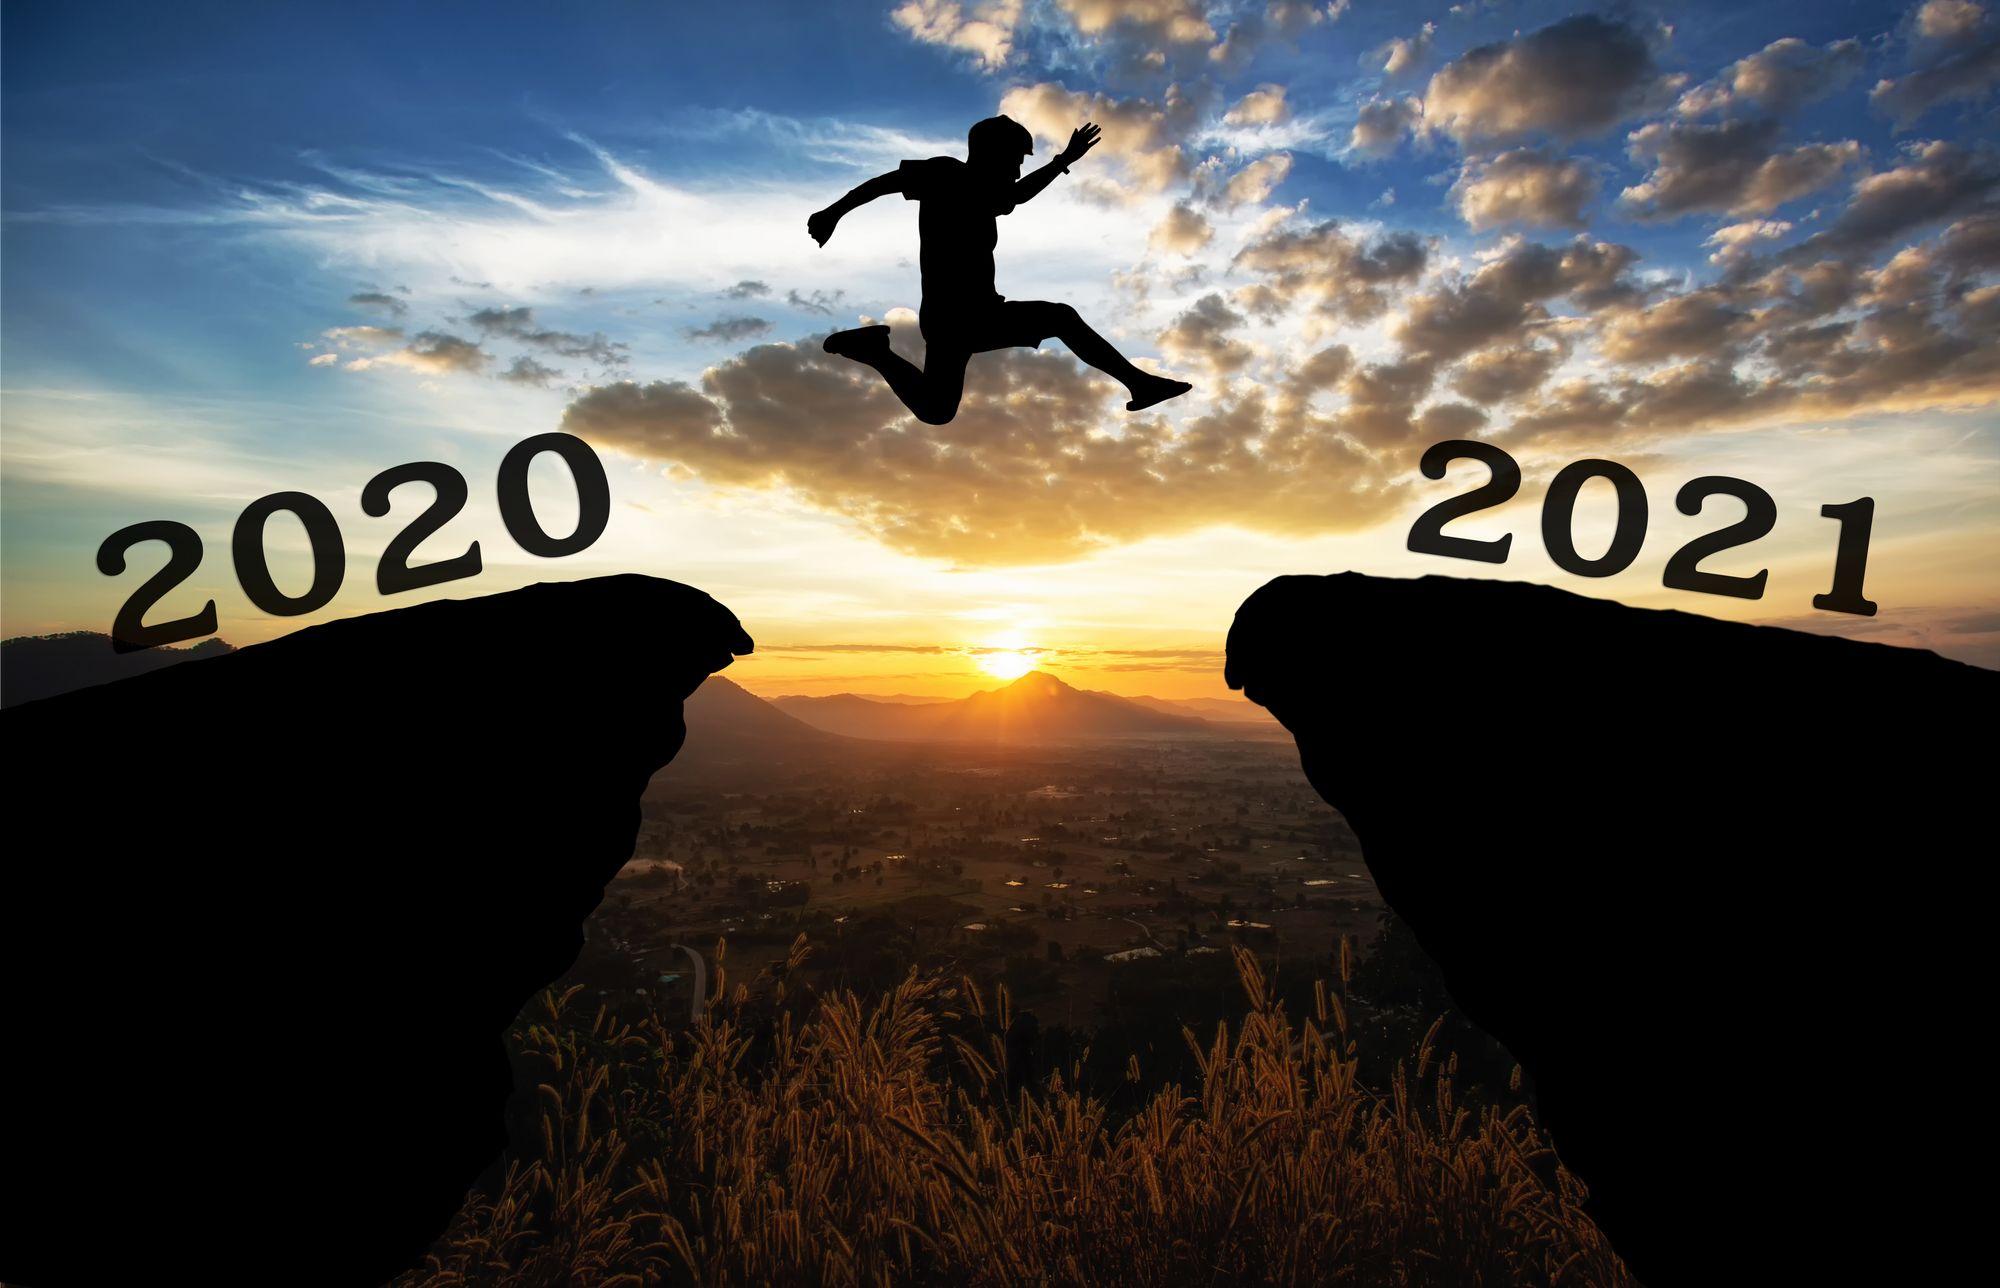 Bring On 2021 Membership Special!